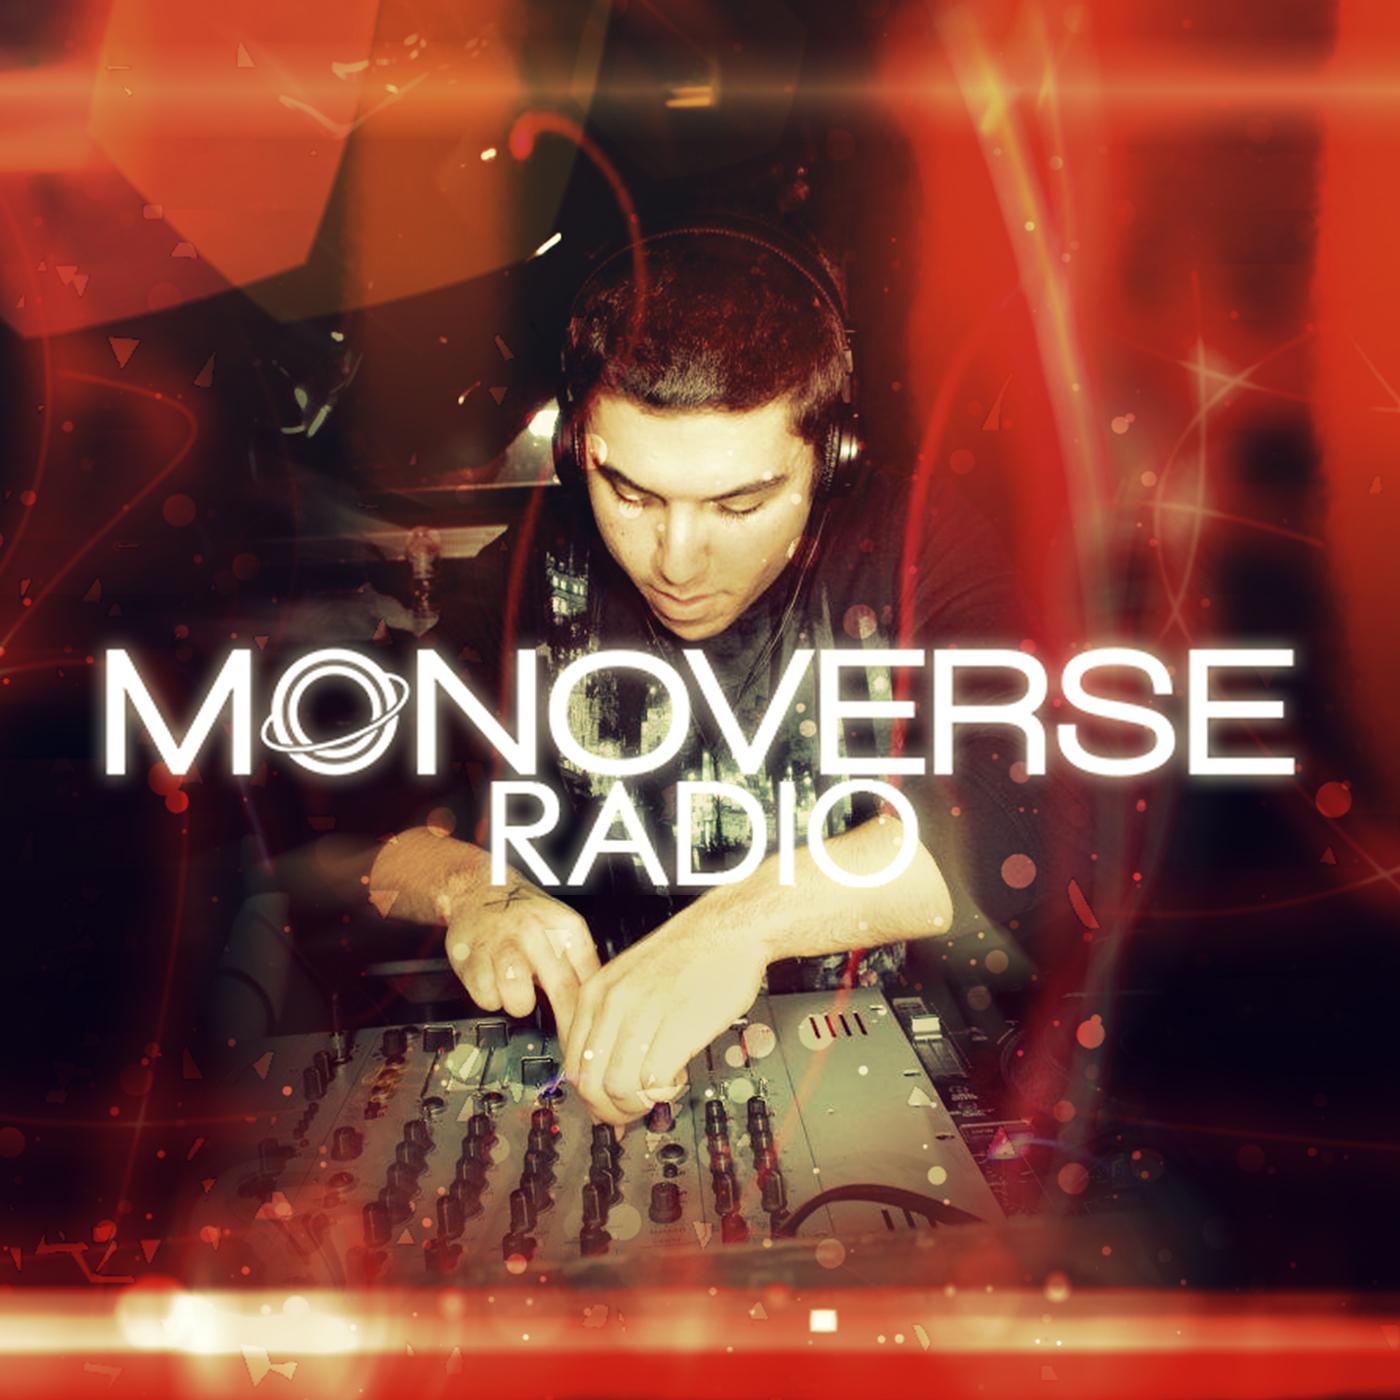 Monoverse Radio